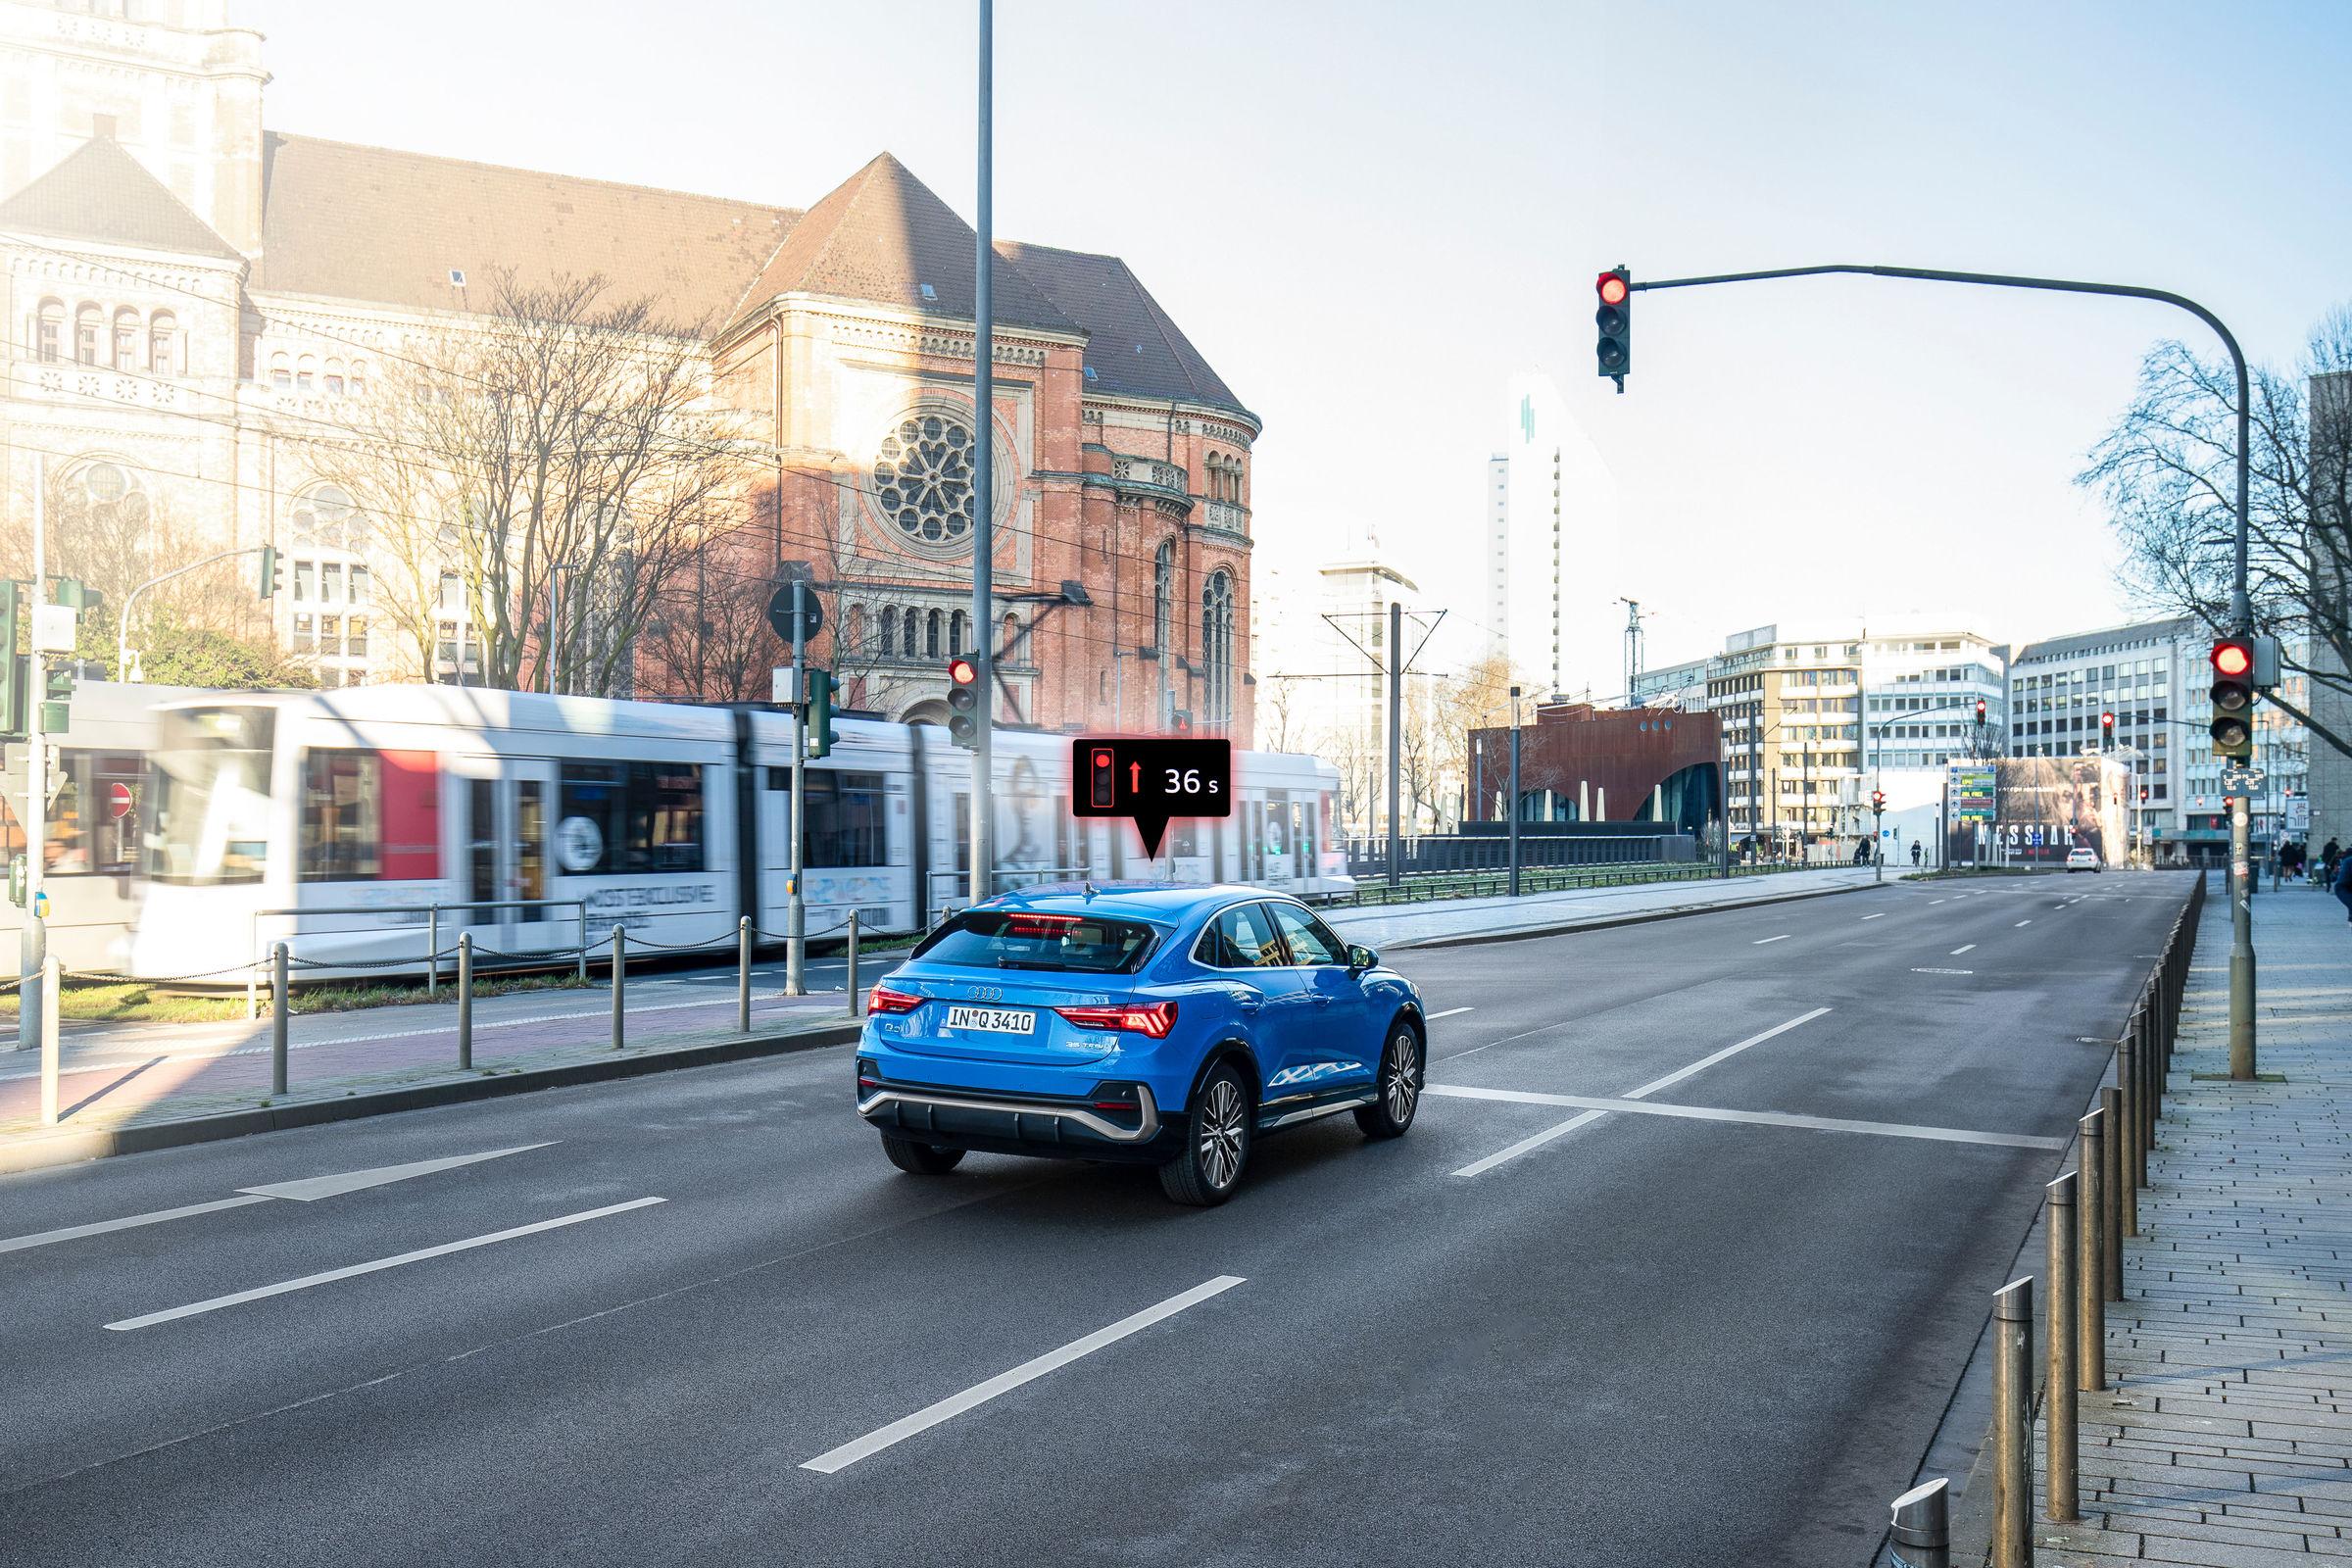 Audi networks with traffic lights in Düsseldorf - Image 2